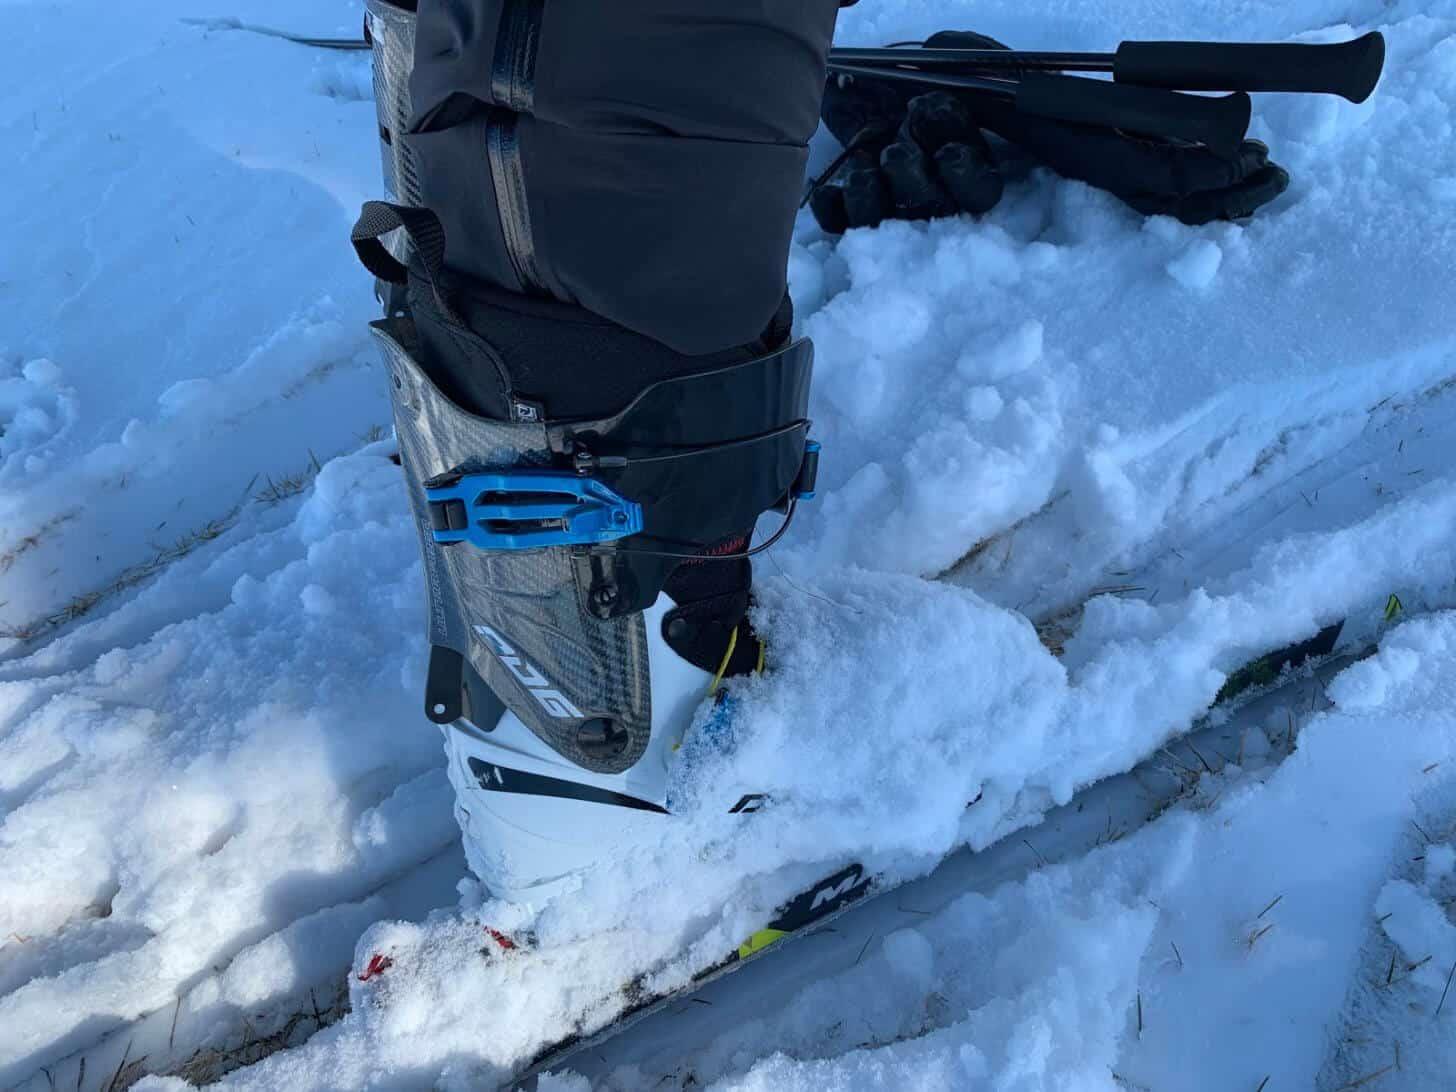 arcteryx zeta sl pant review cuff size ski